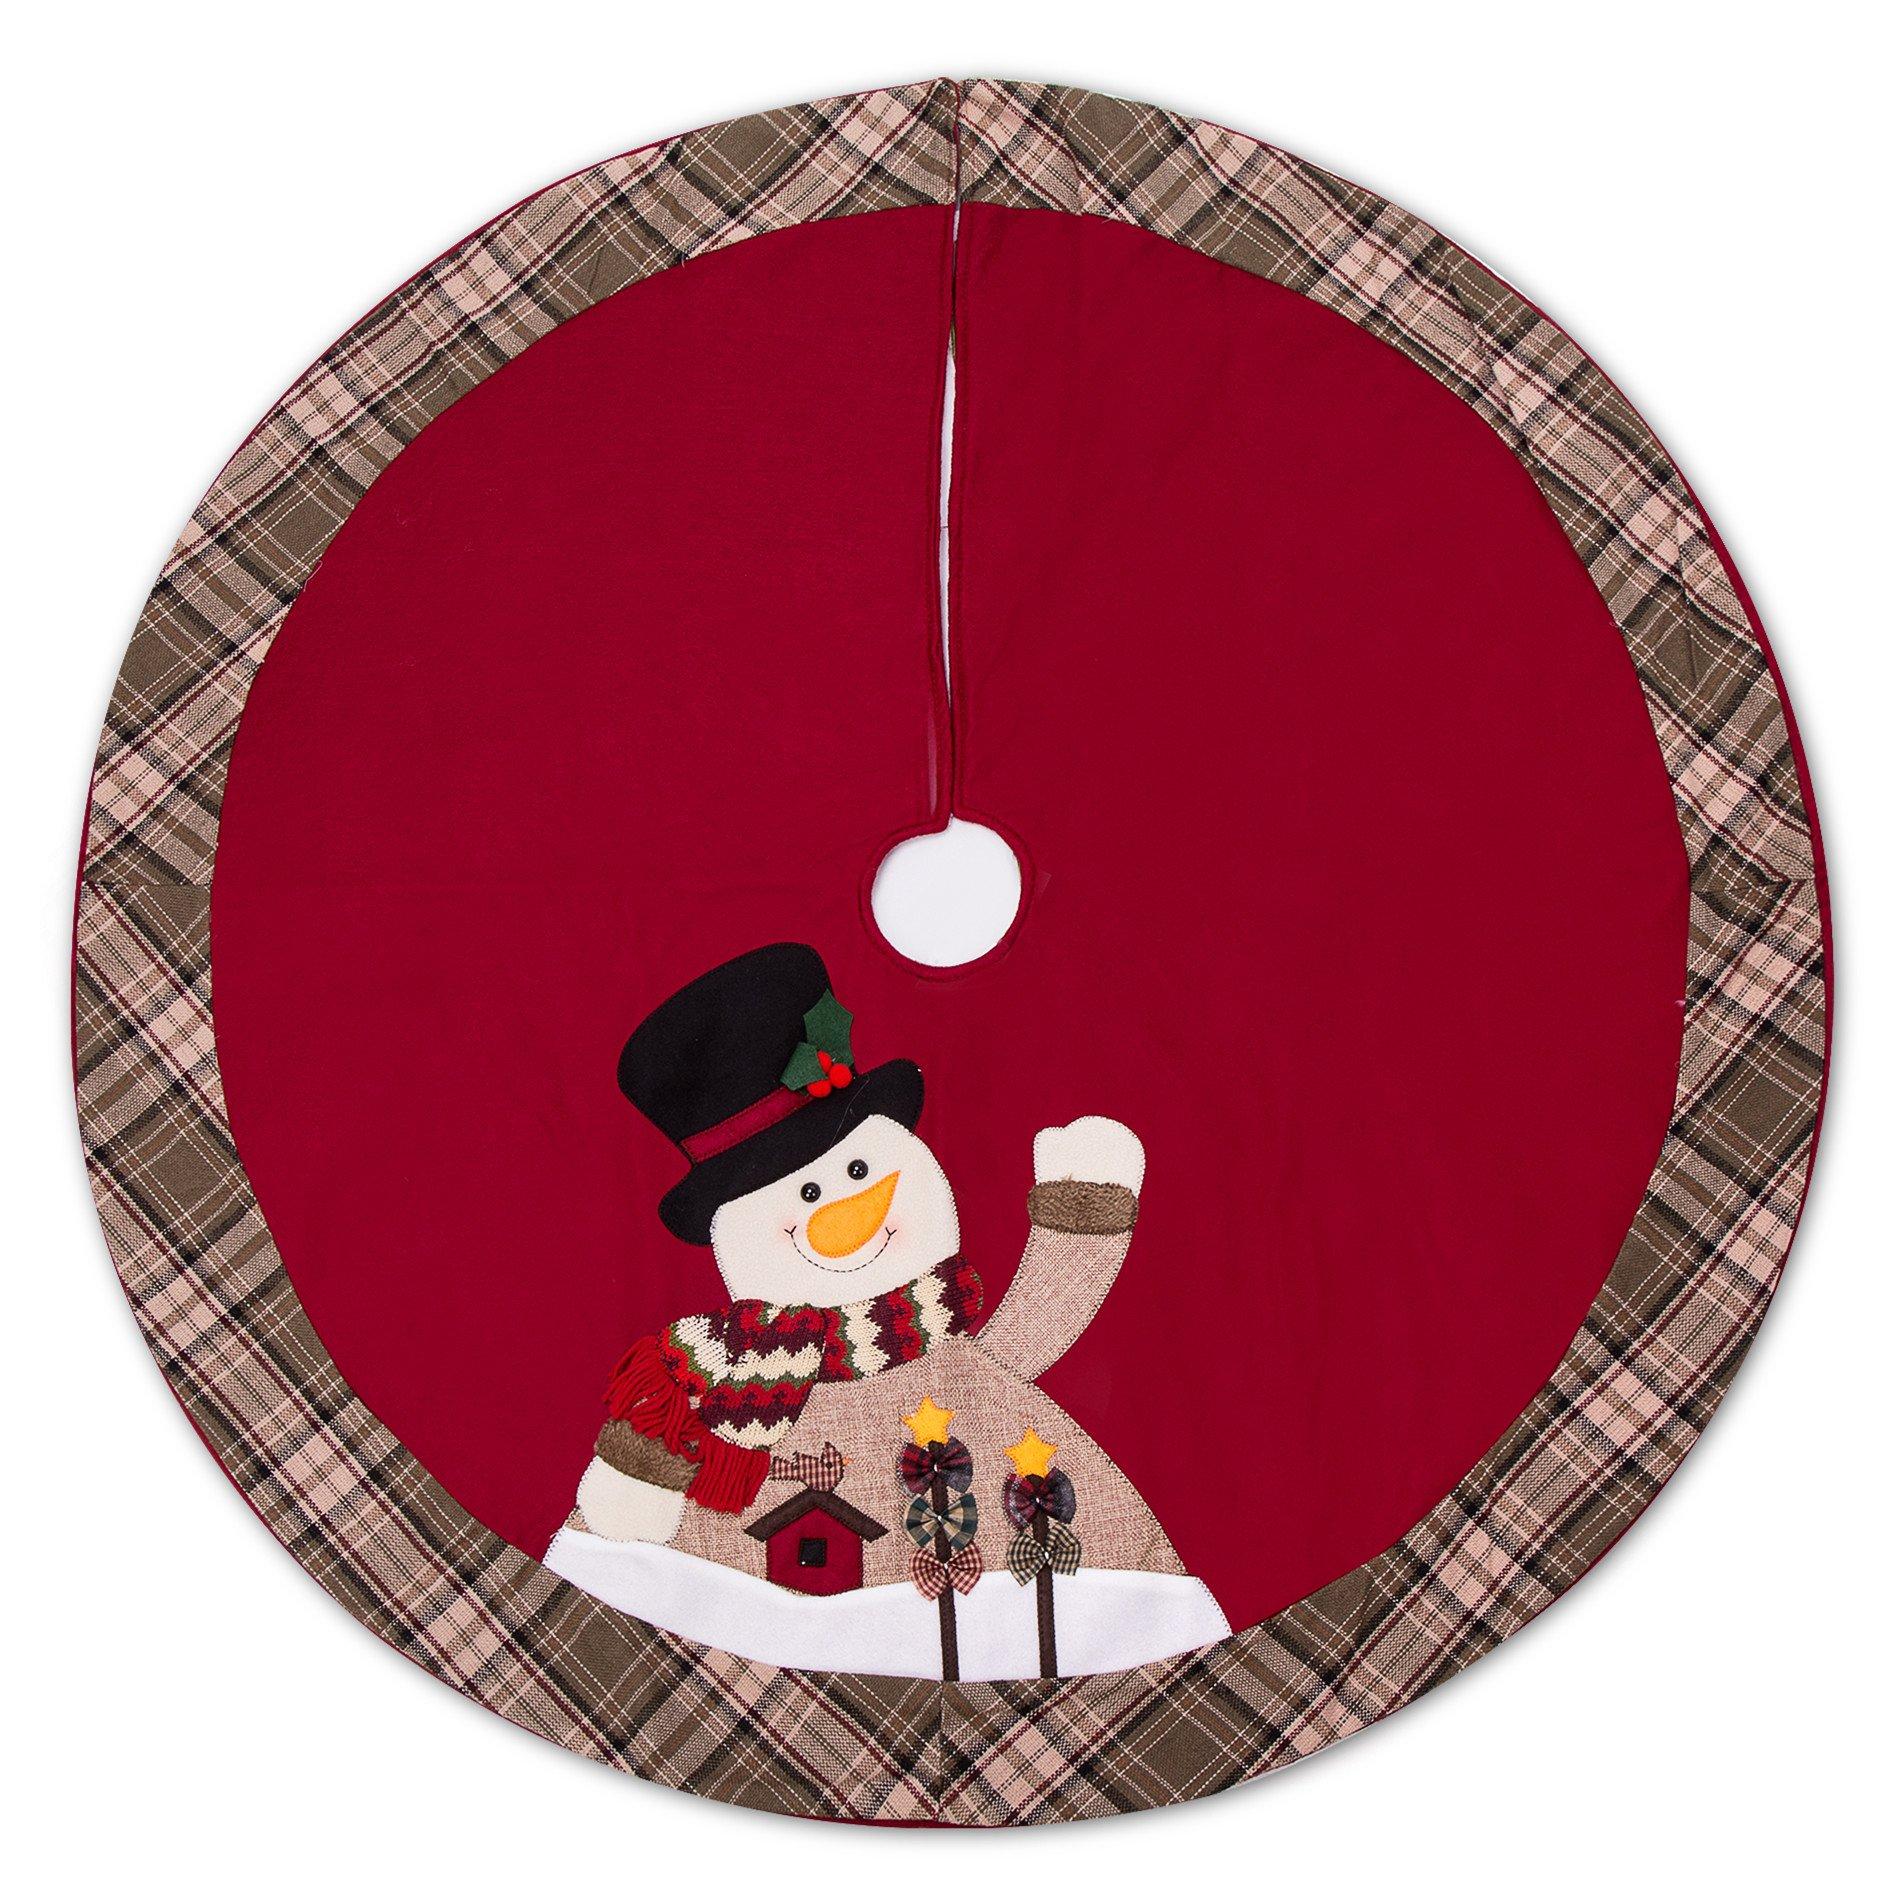 iPEGTOP 42'' Christmas Tree Skirt - Snowman Xmas Tree Skirt Holiday Decorations - Cherry Non Woven and Tartan Rim